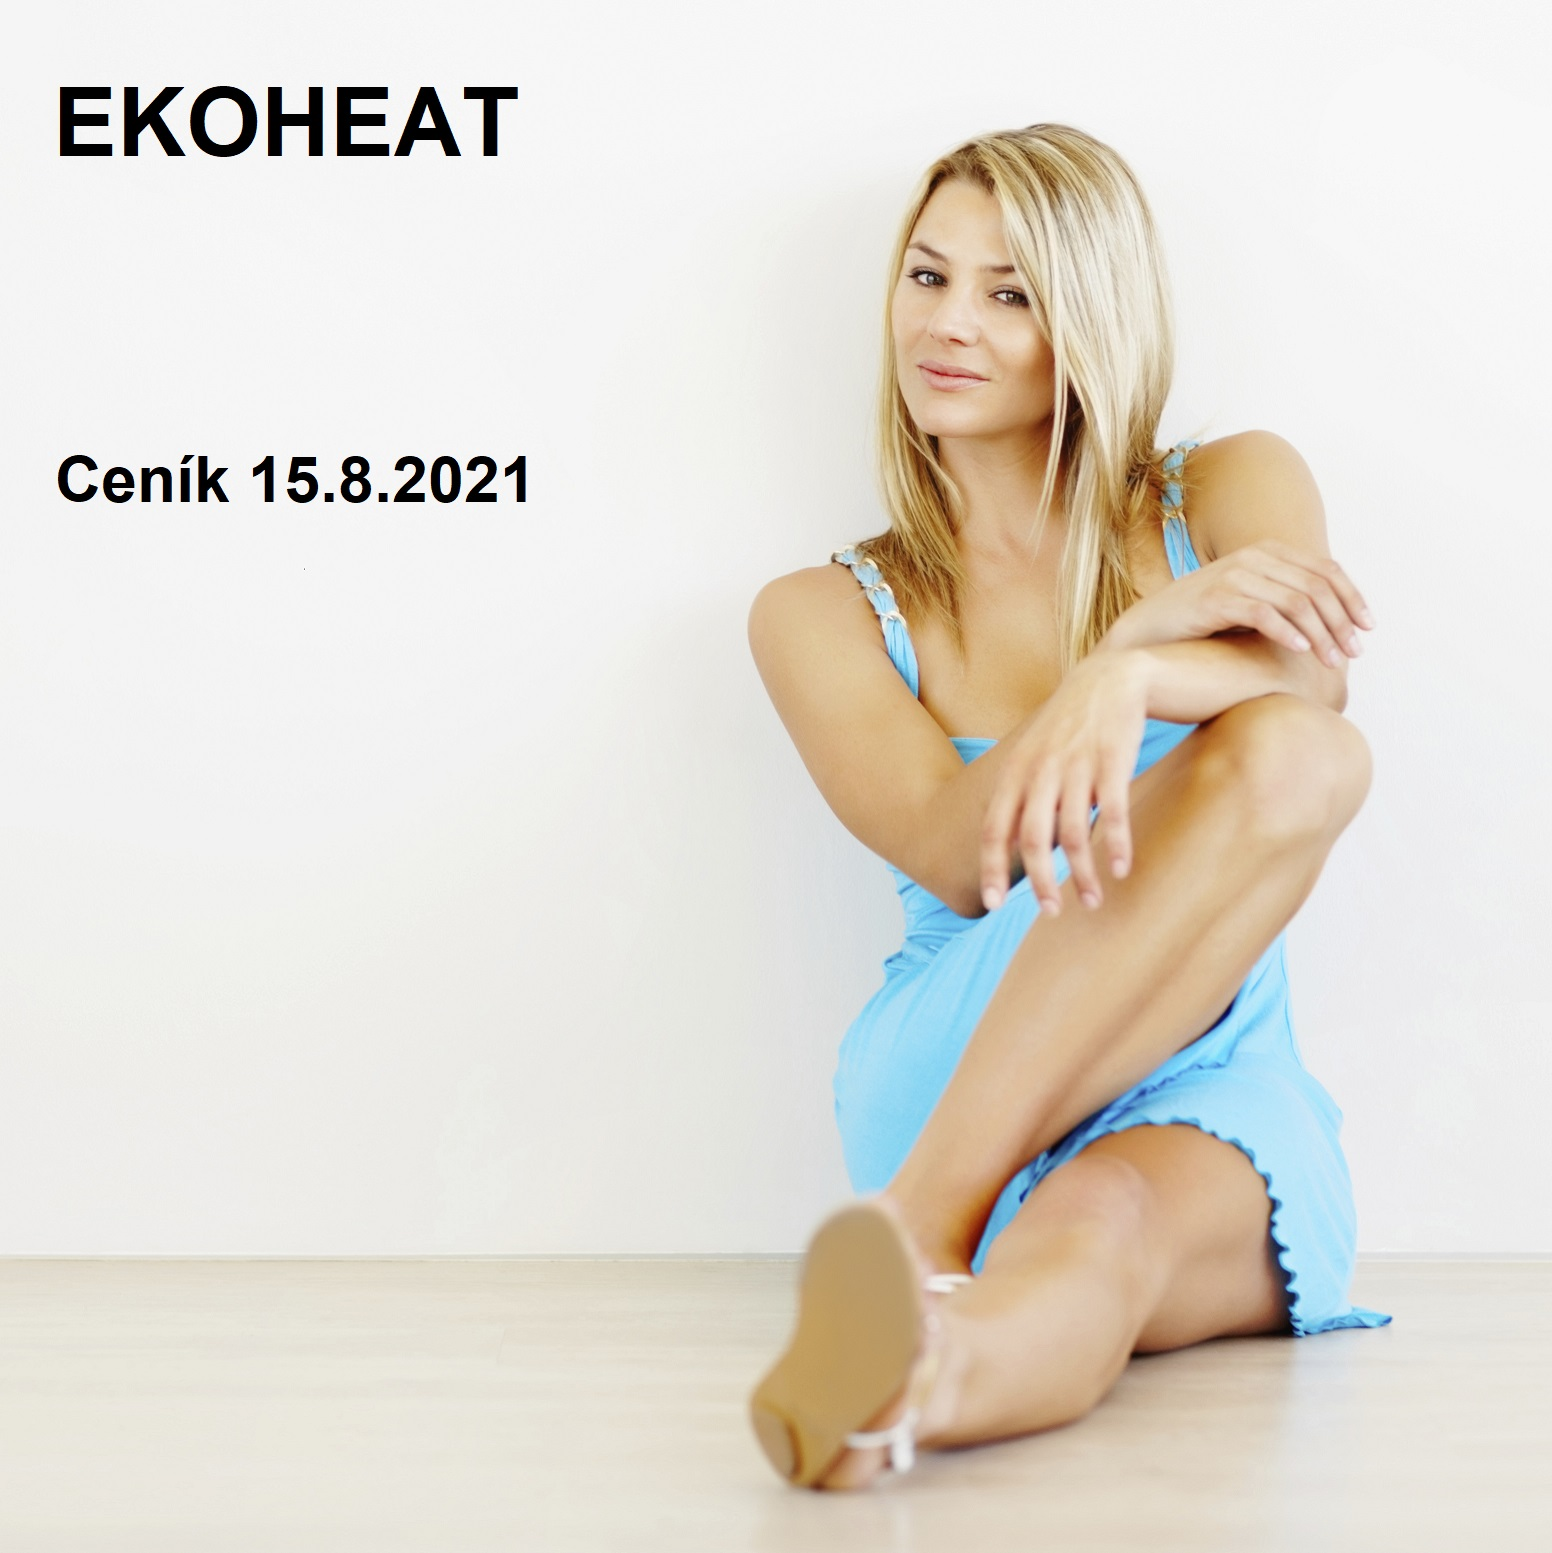 Ceník EKOHEAT od 15.8.2021